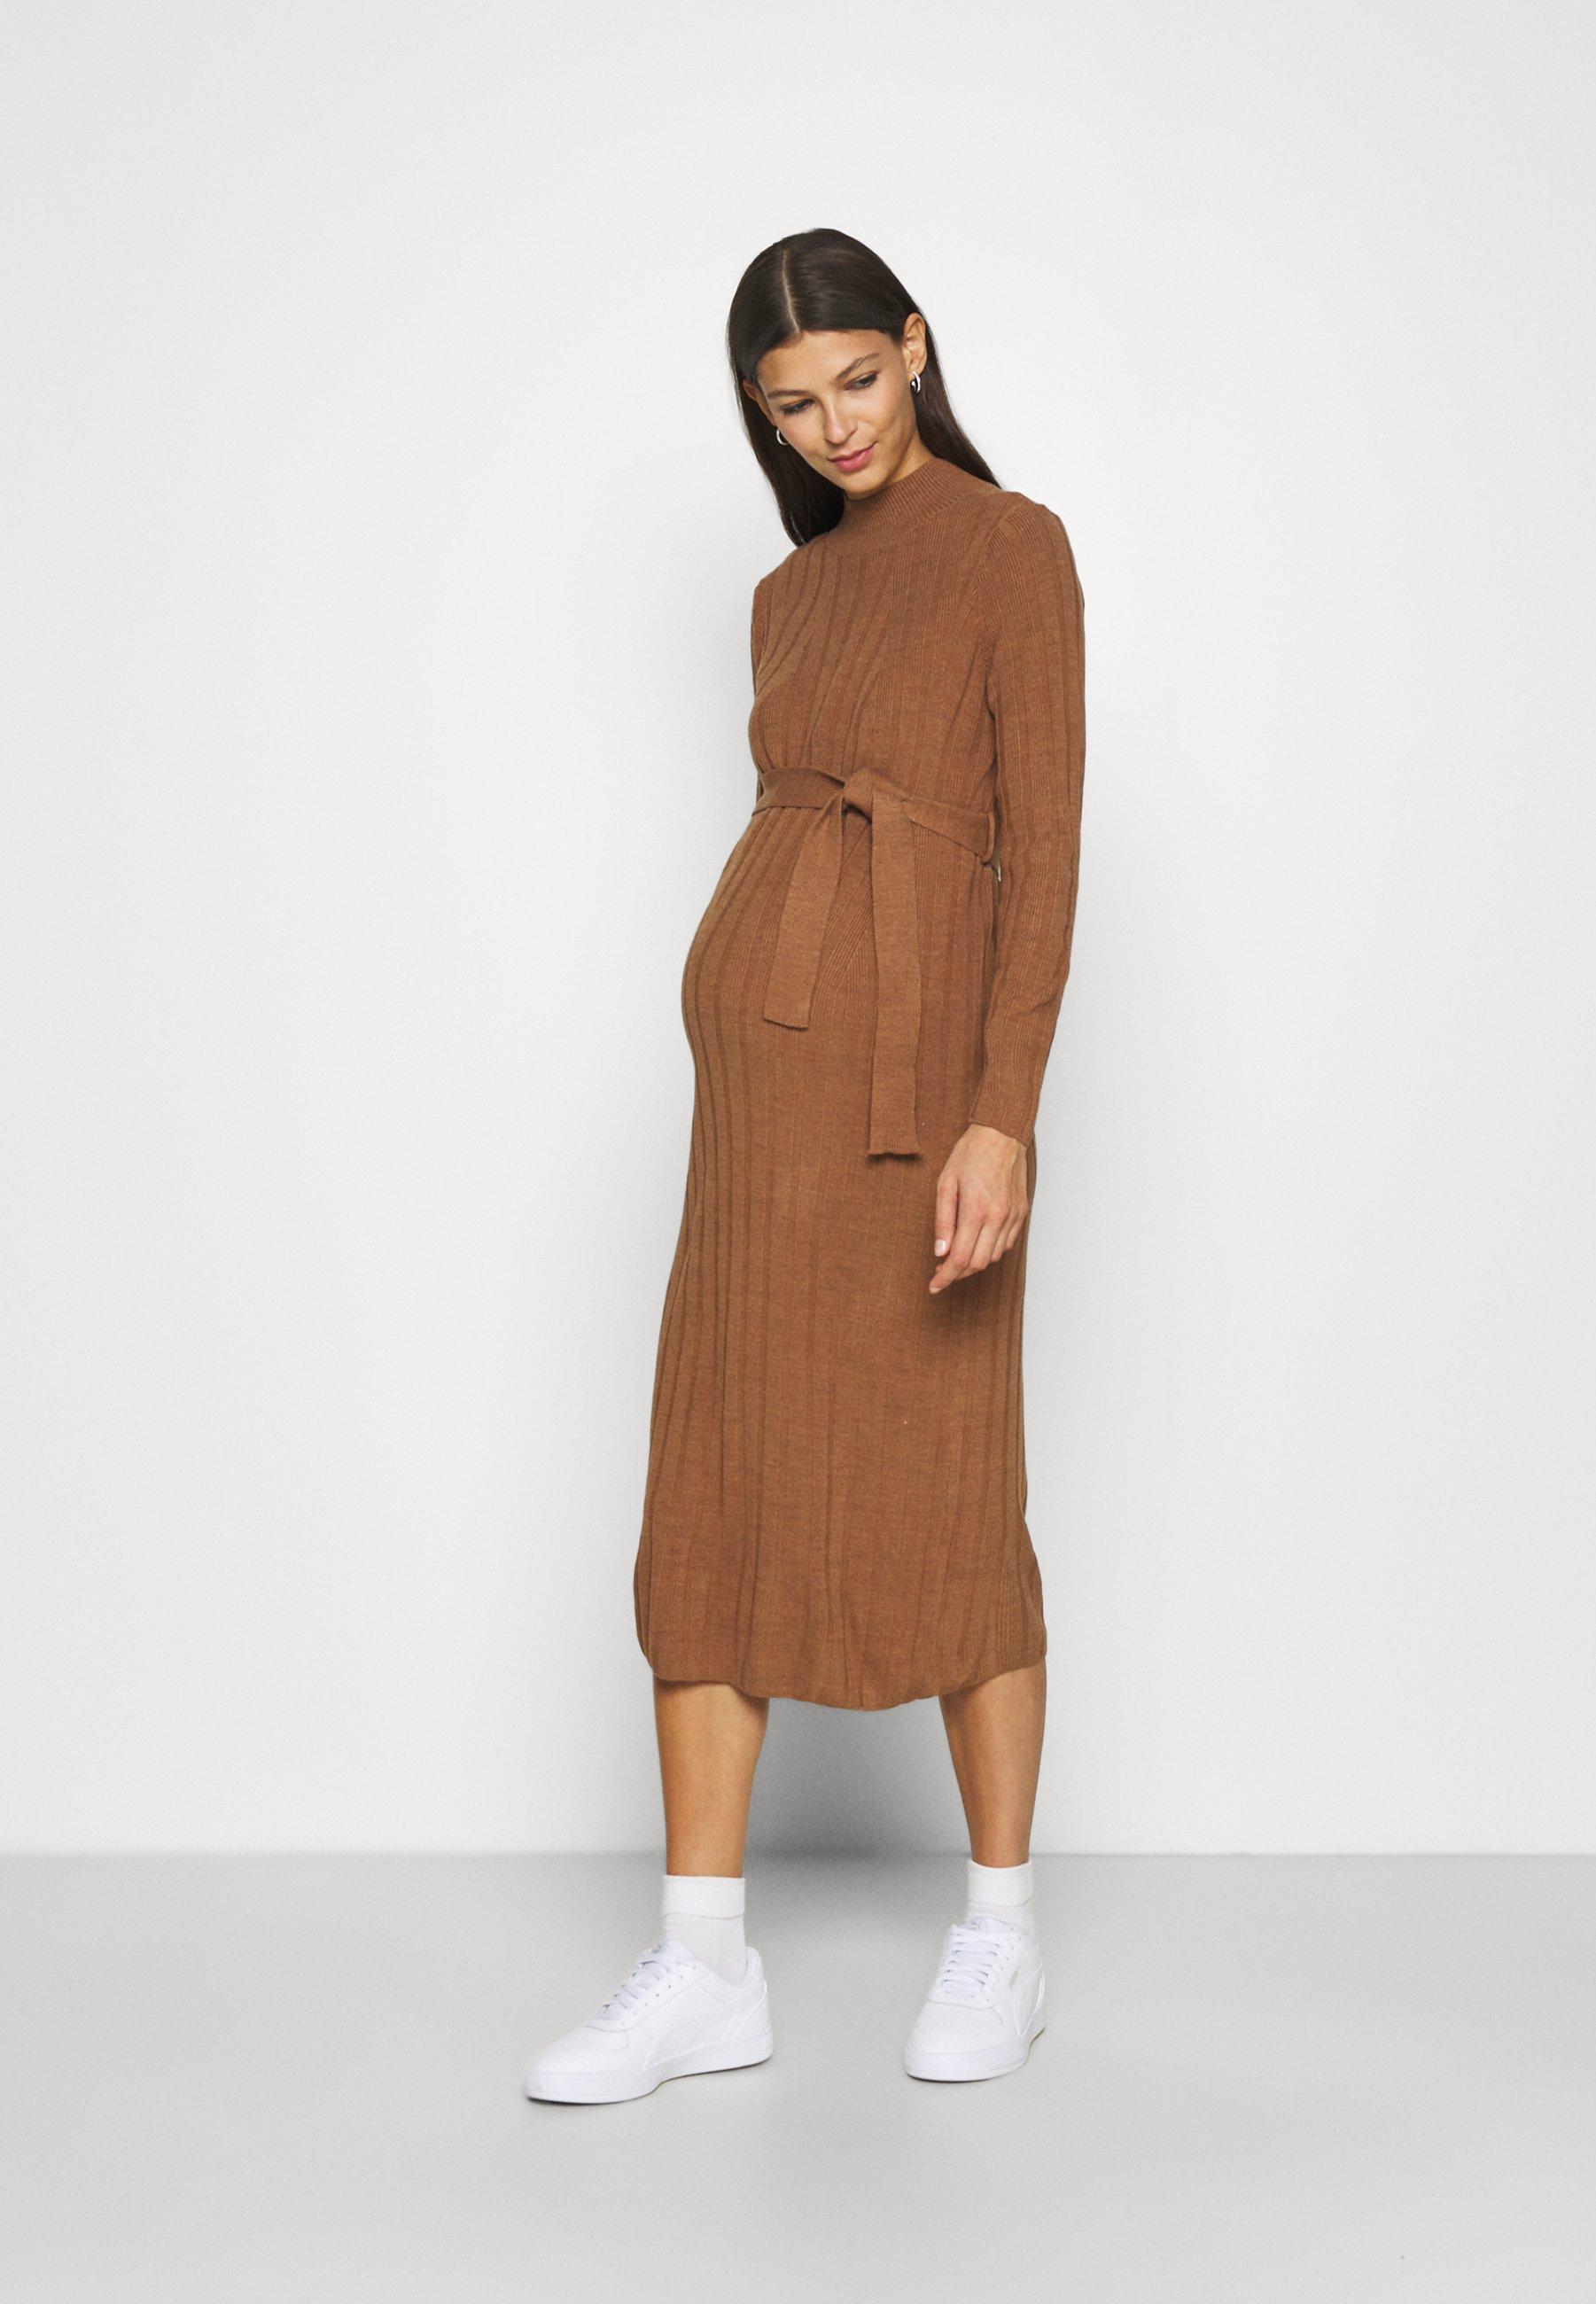 Femme OLMNEW TESSA O-NECK DRESS - Robe pull